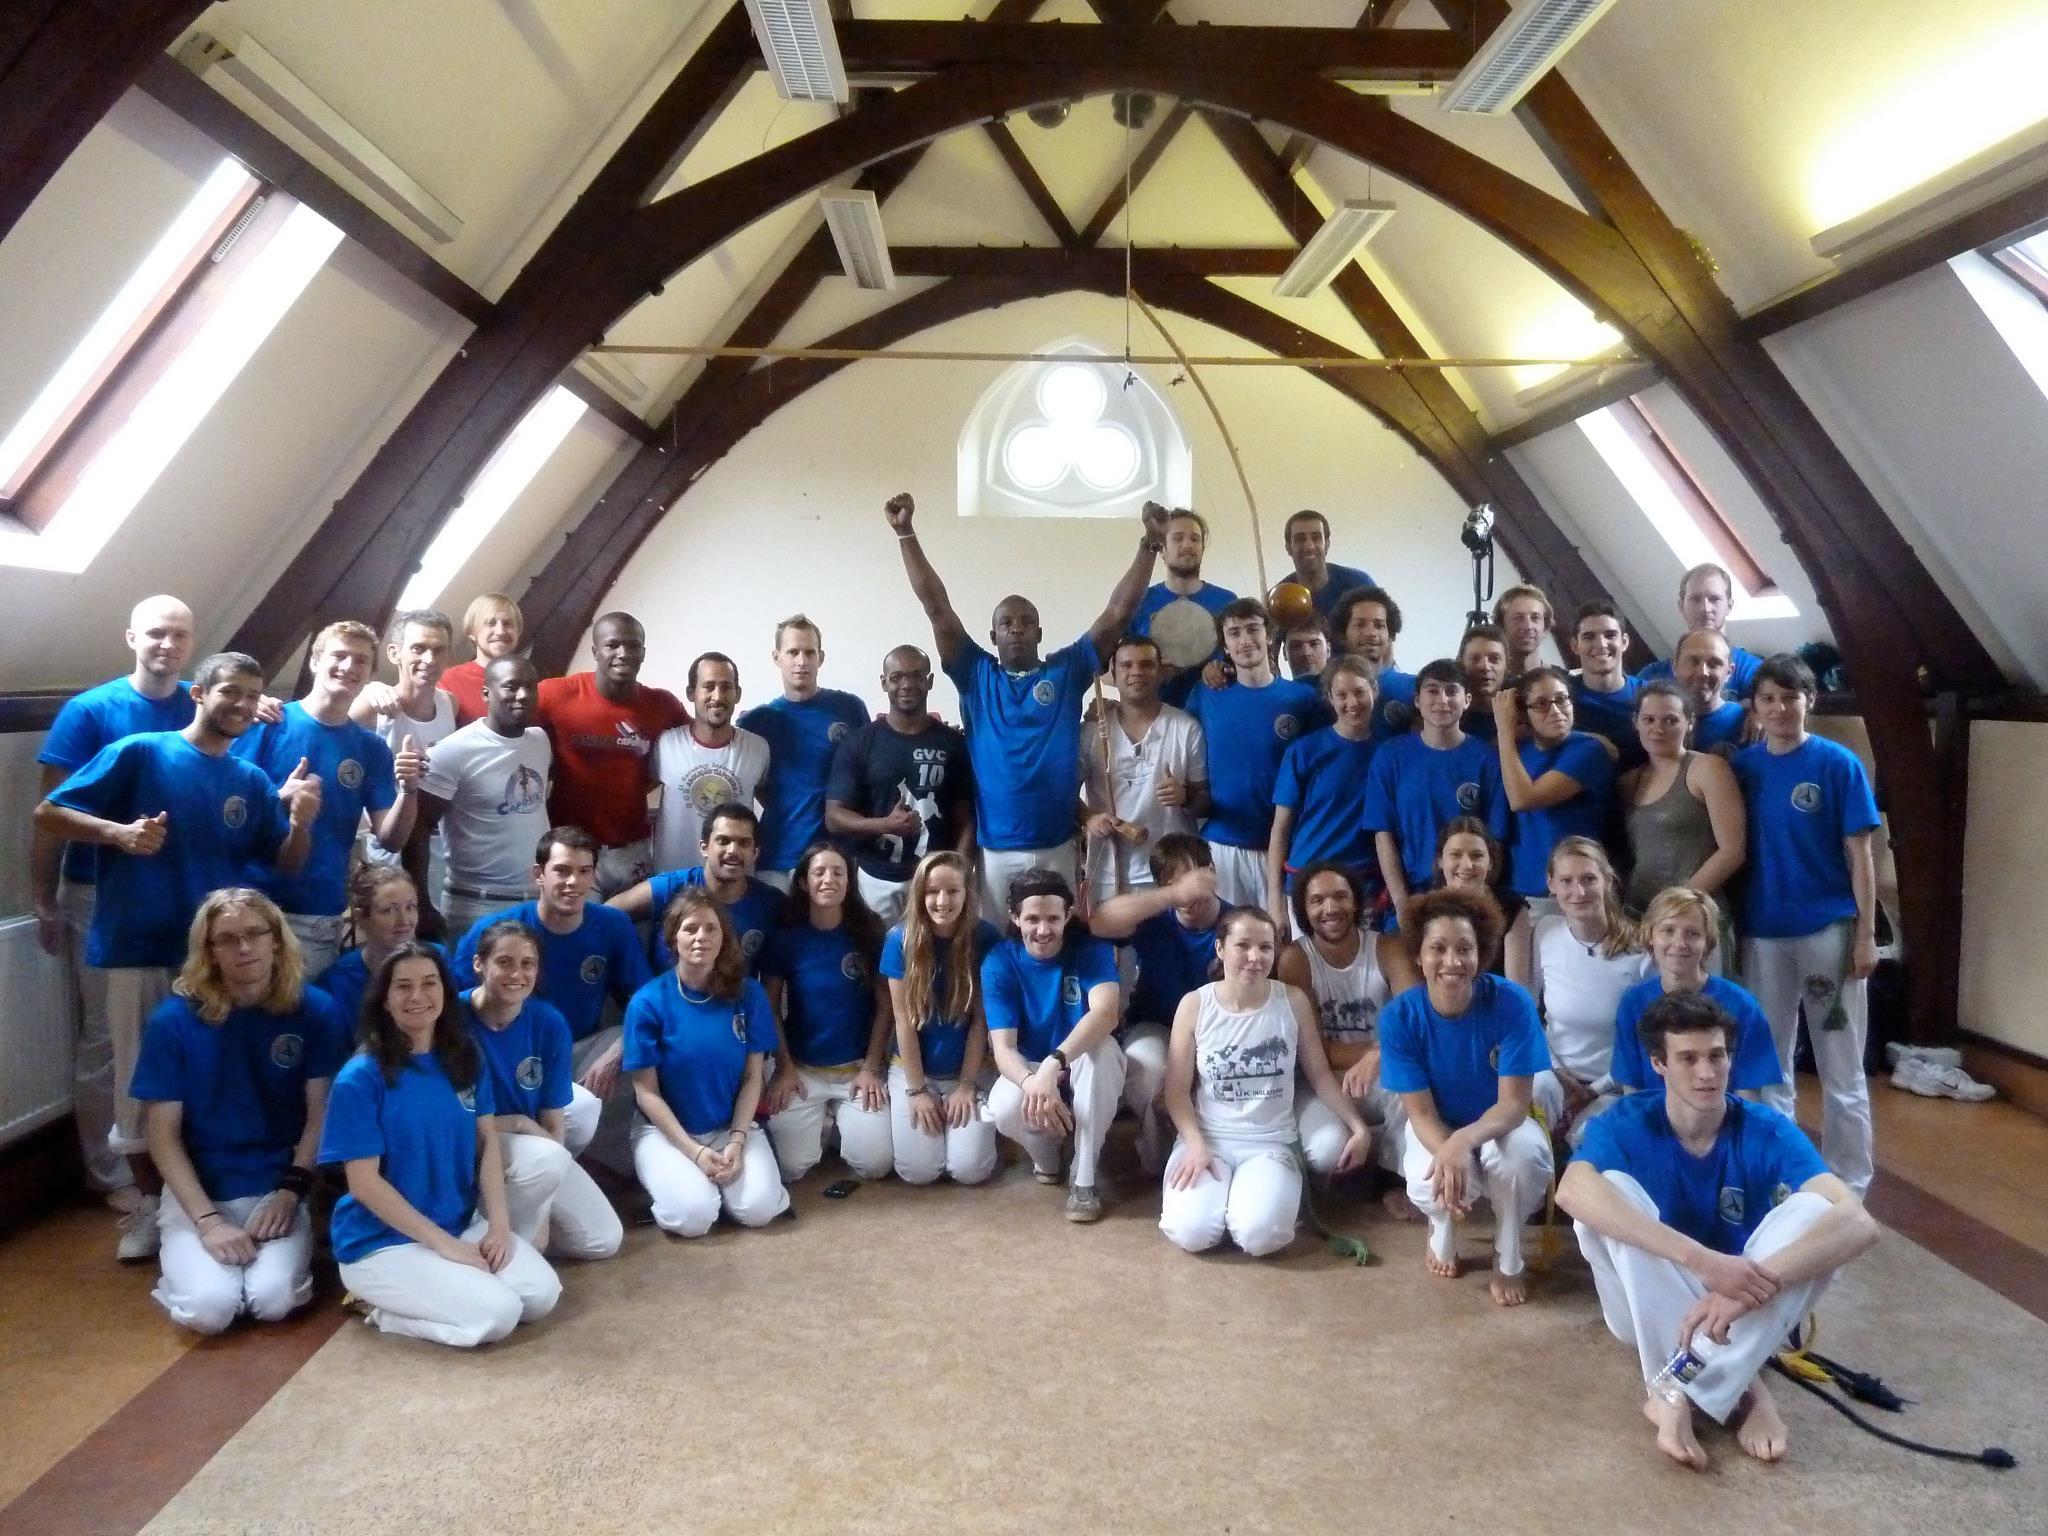 Abolicao Capoeira Oxford Batizado, Mestre Luis Negao